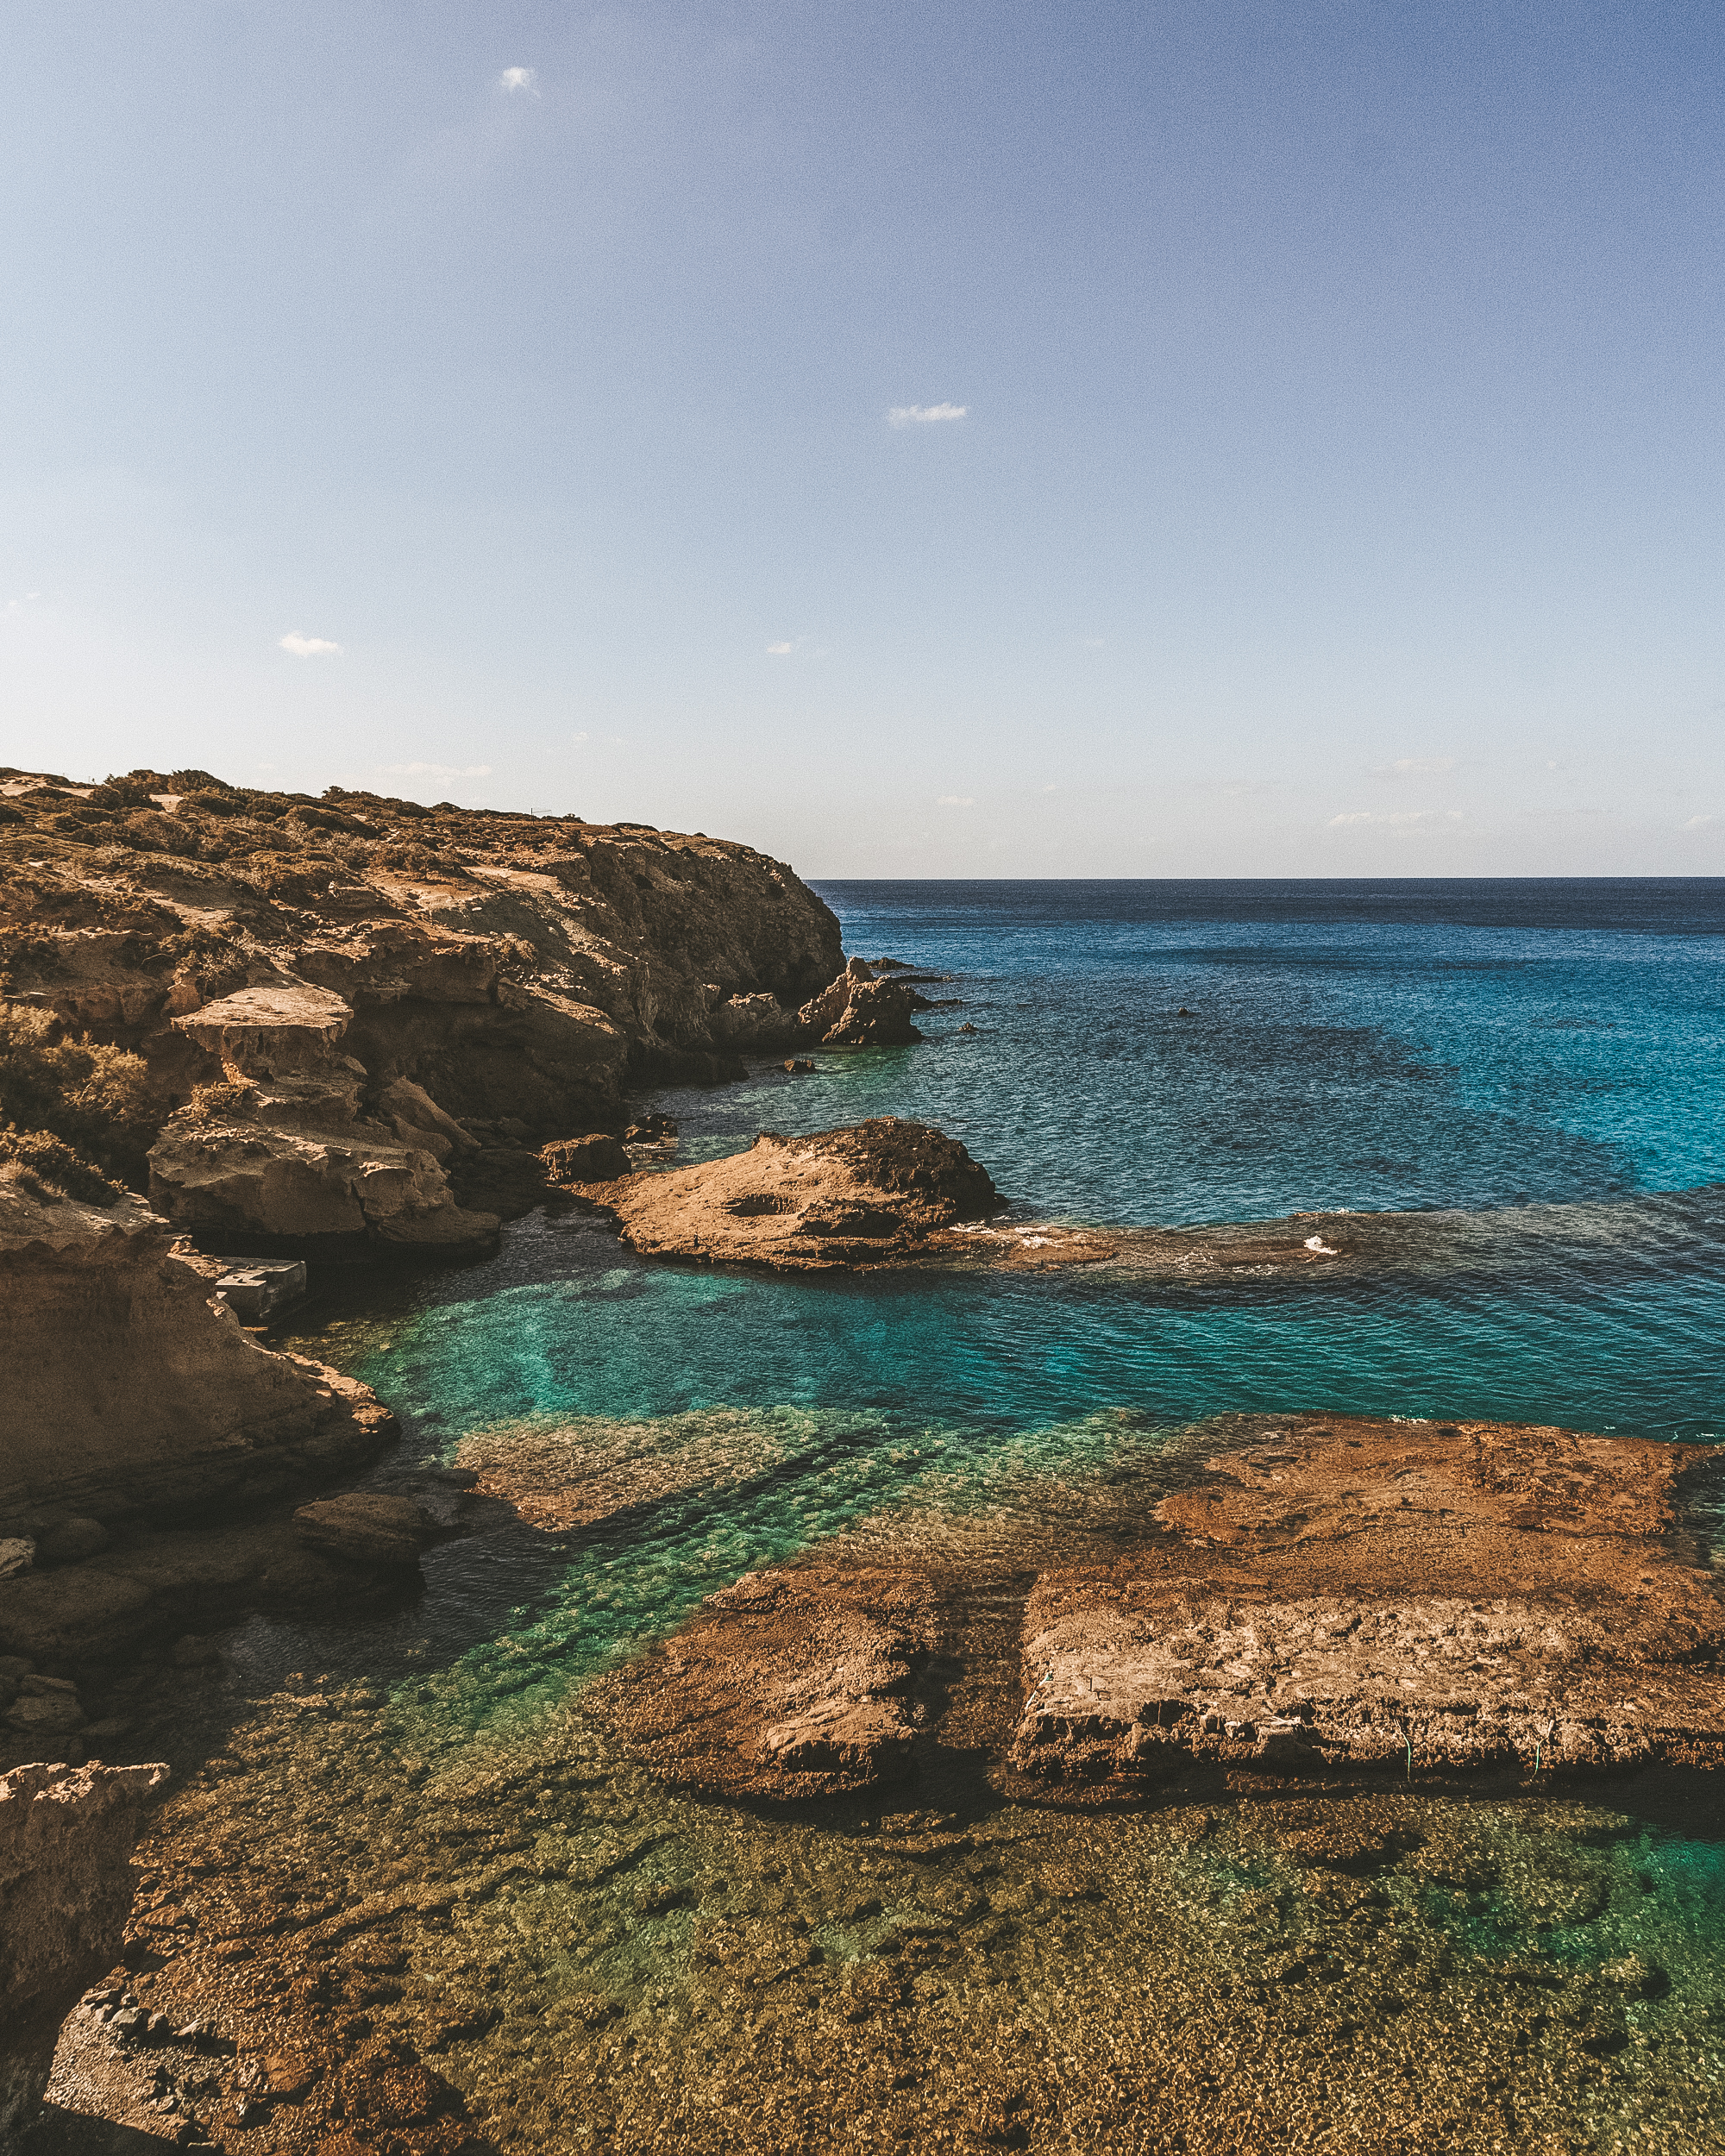 Stunning Blue Sea at Plathieno Beach, Milos, Greece